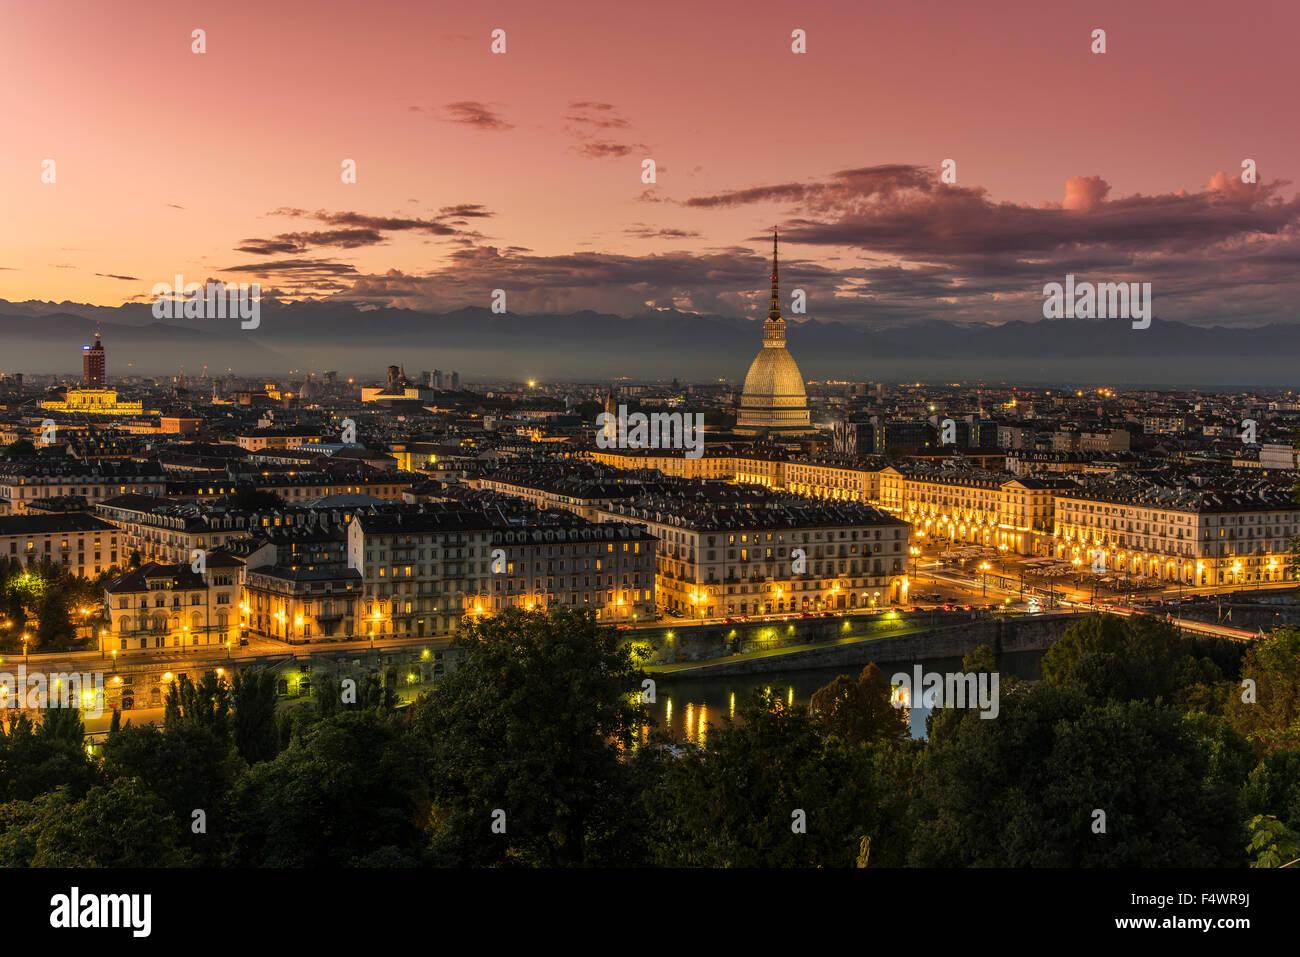 City skyline at sunset, Turin, Piedmont, Italy - Stock Image